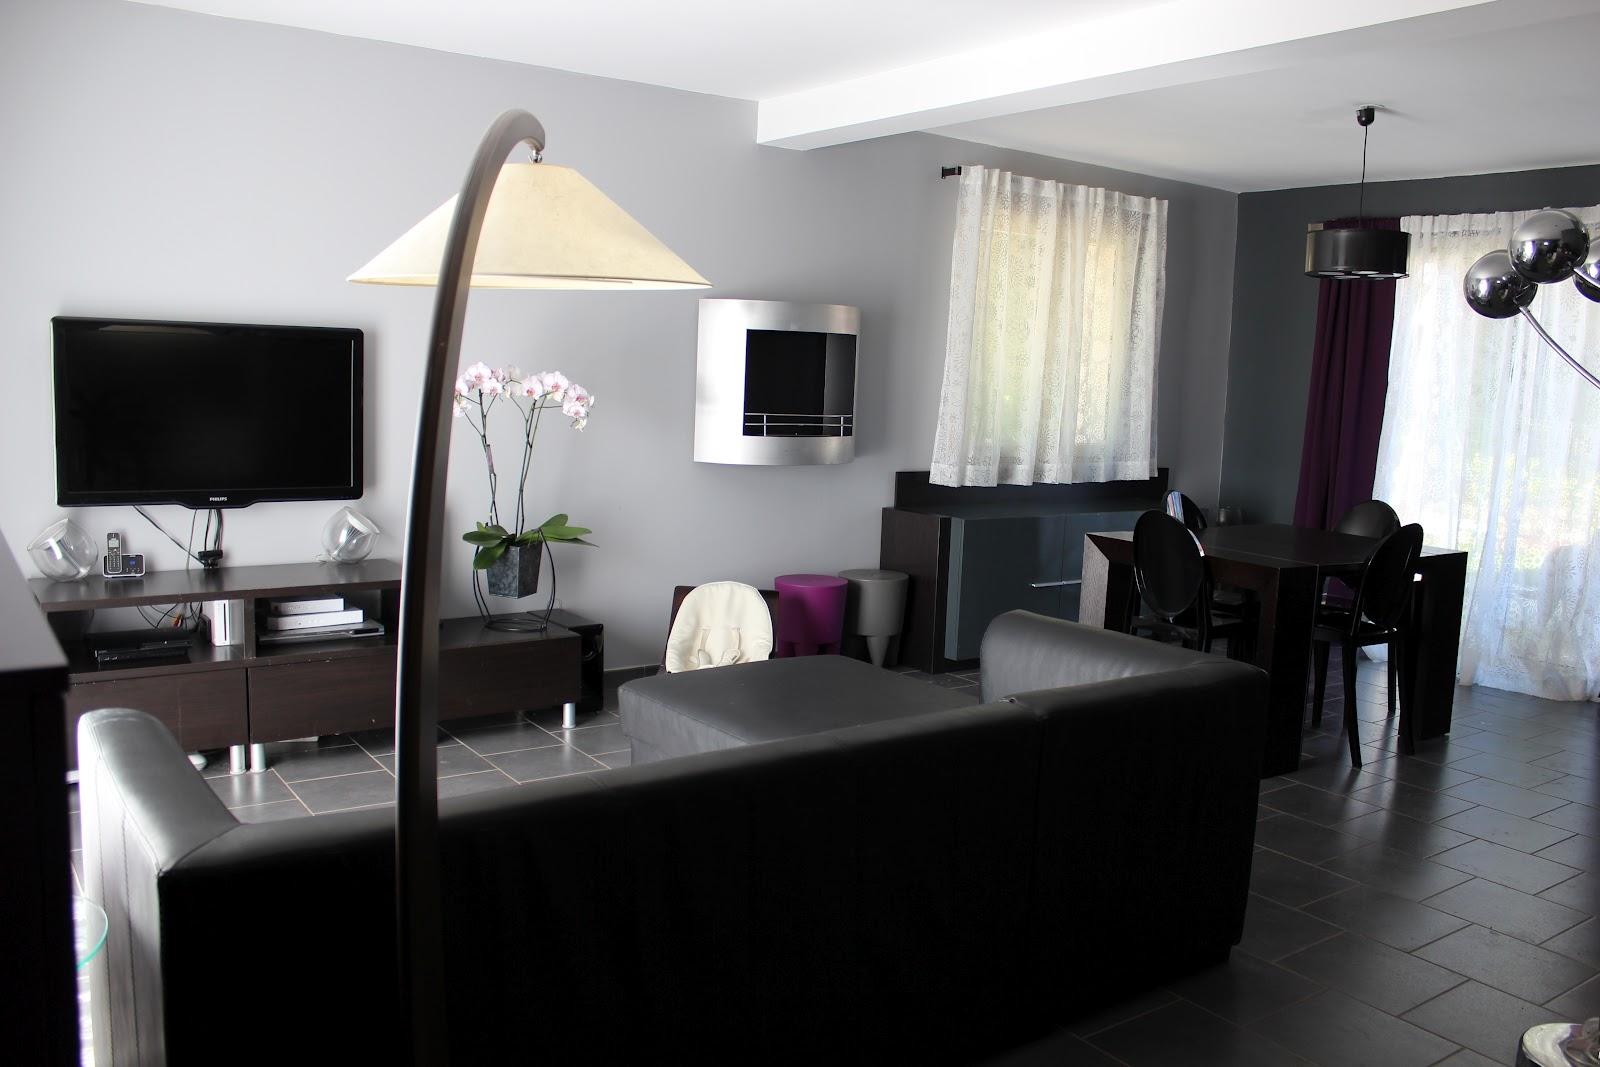 laekinol in dolomieu pi ce de vie. Black Bedroom Furniture Sets. Home Design Ideas